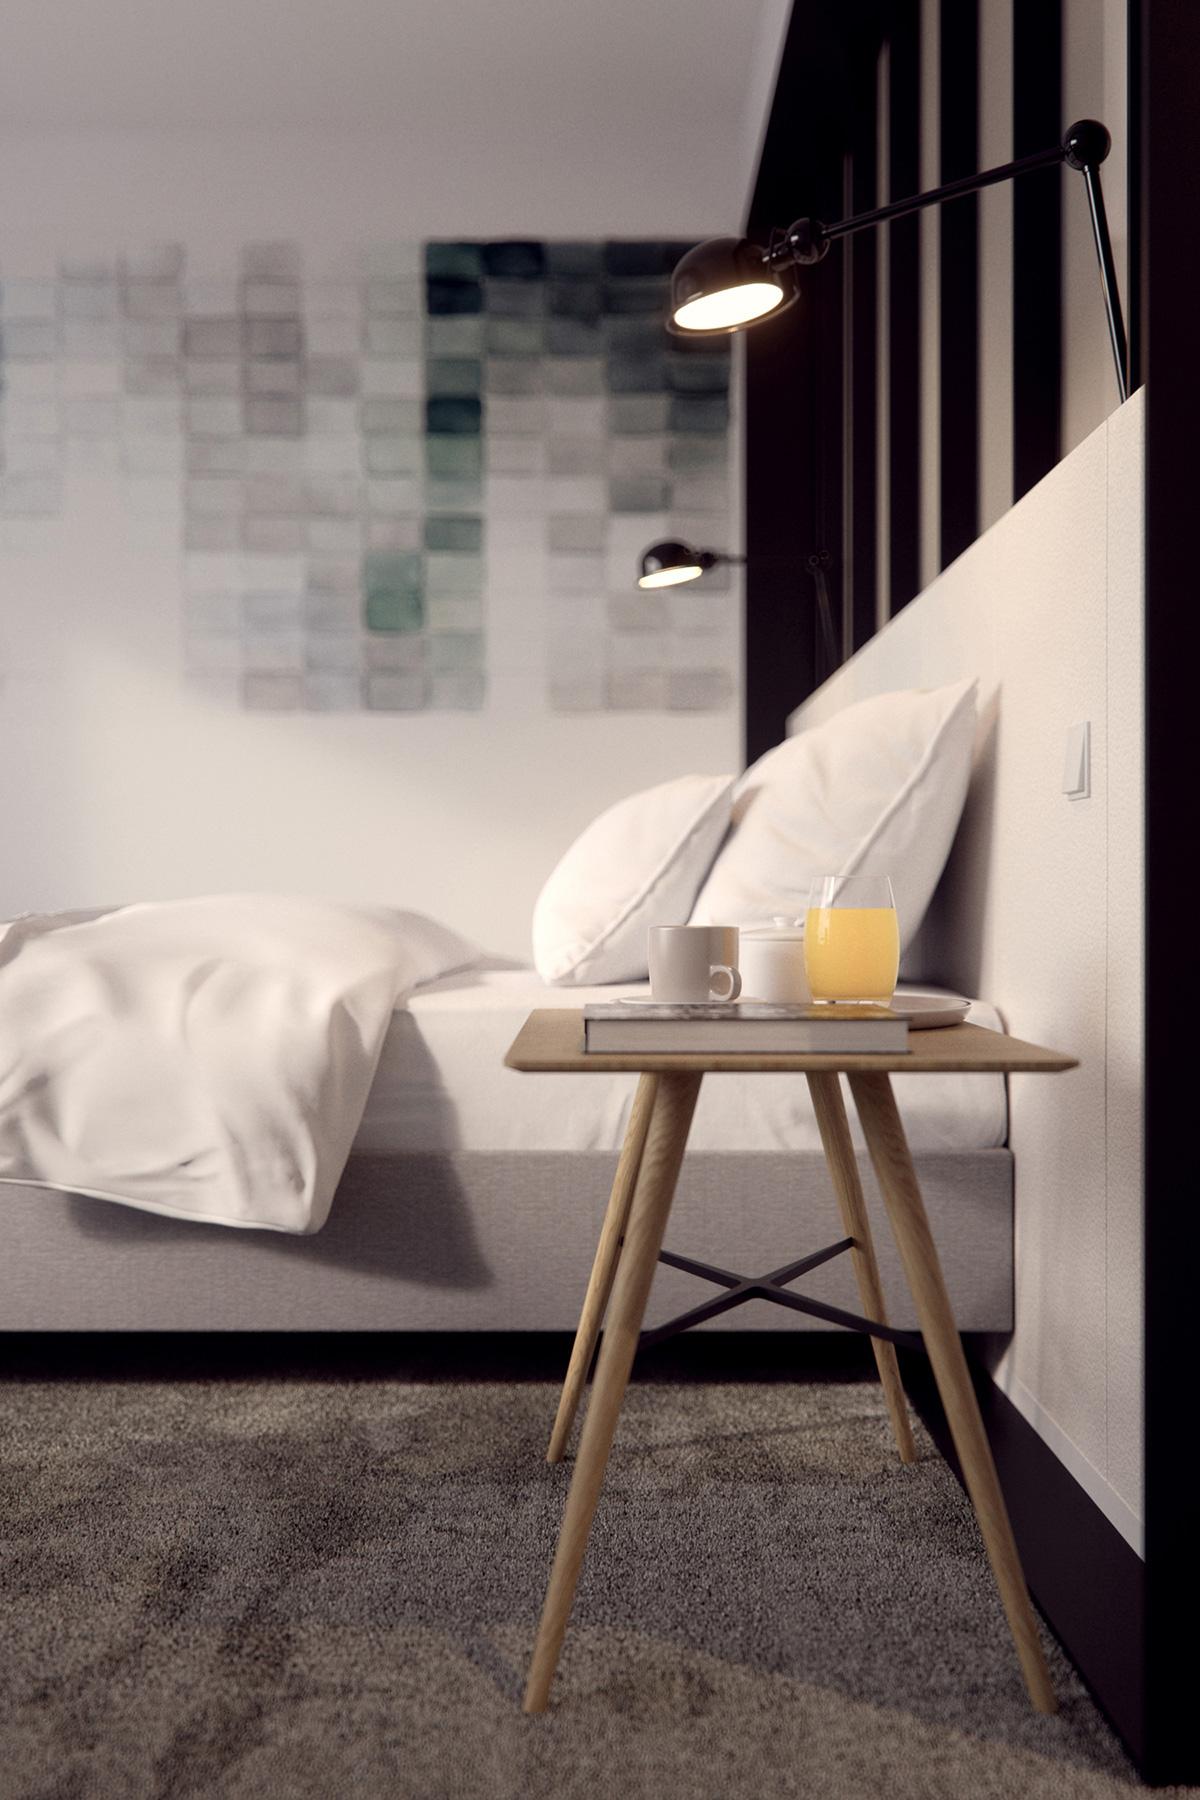 CarmineCrimson-Archviz-2016-hotelparislyon-chstd-zoom2_a.jpg